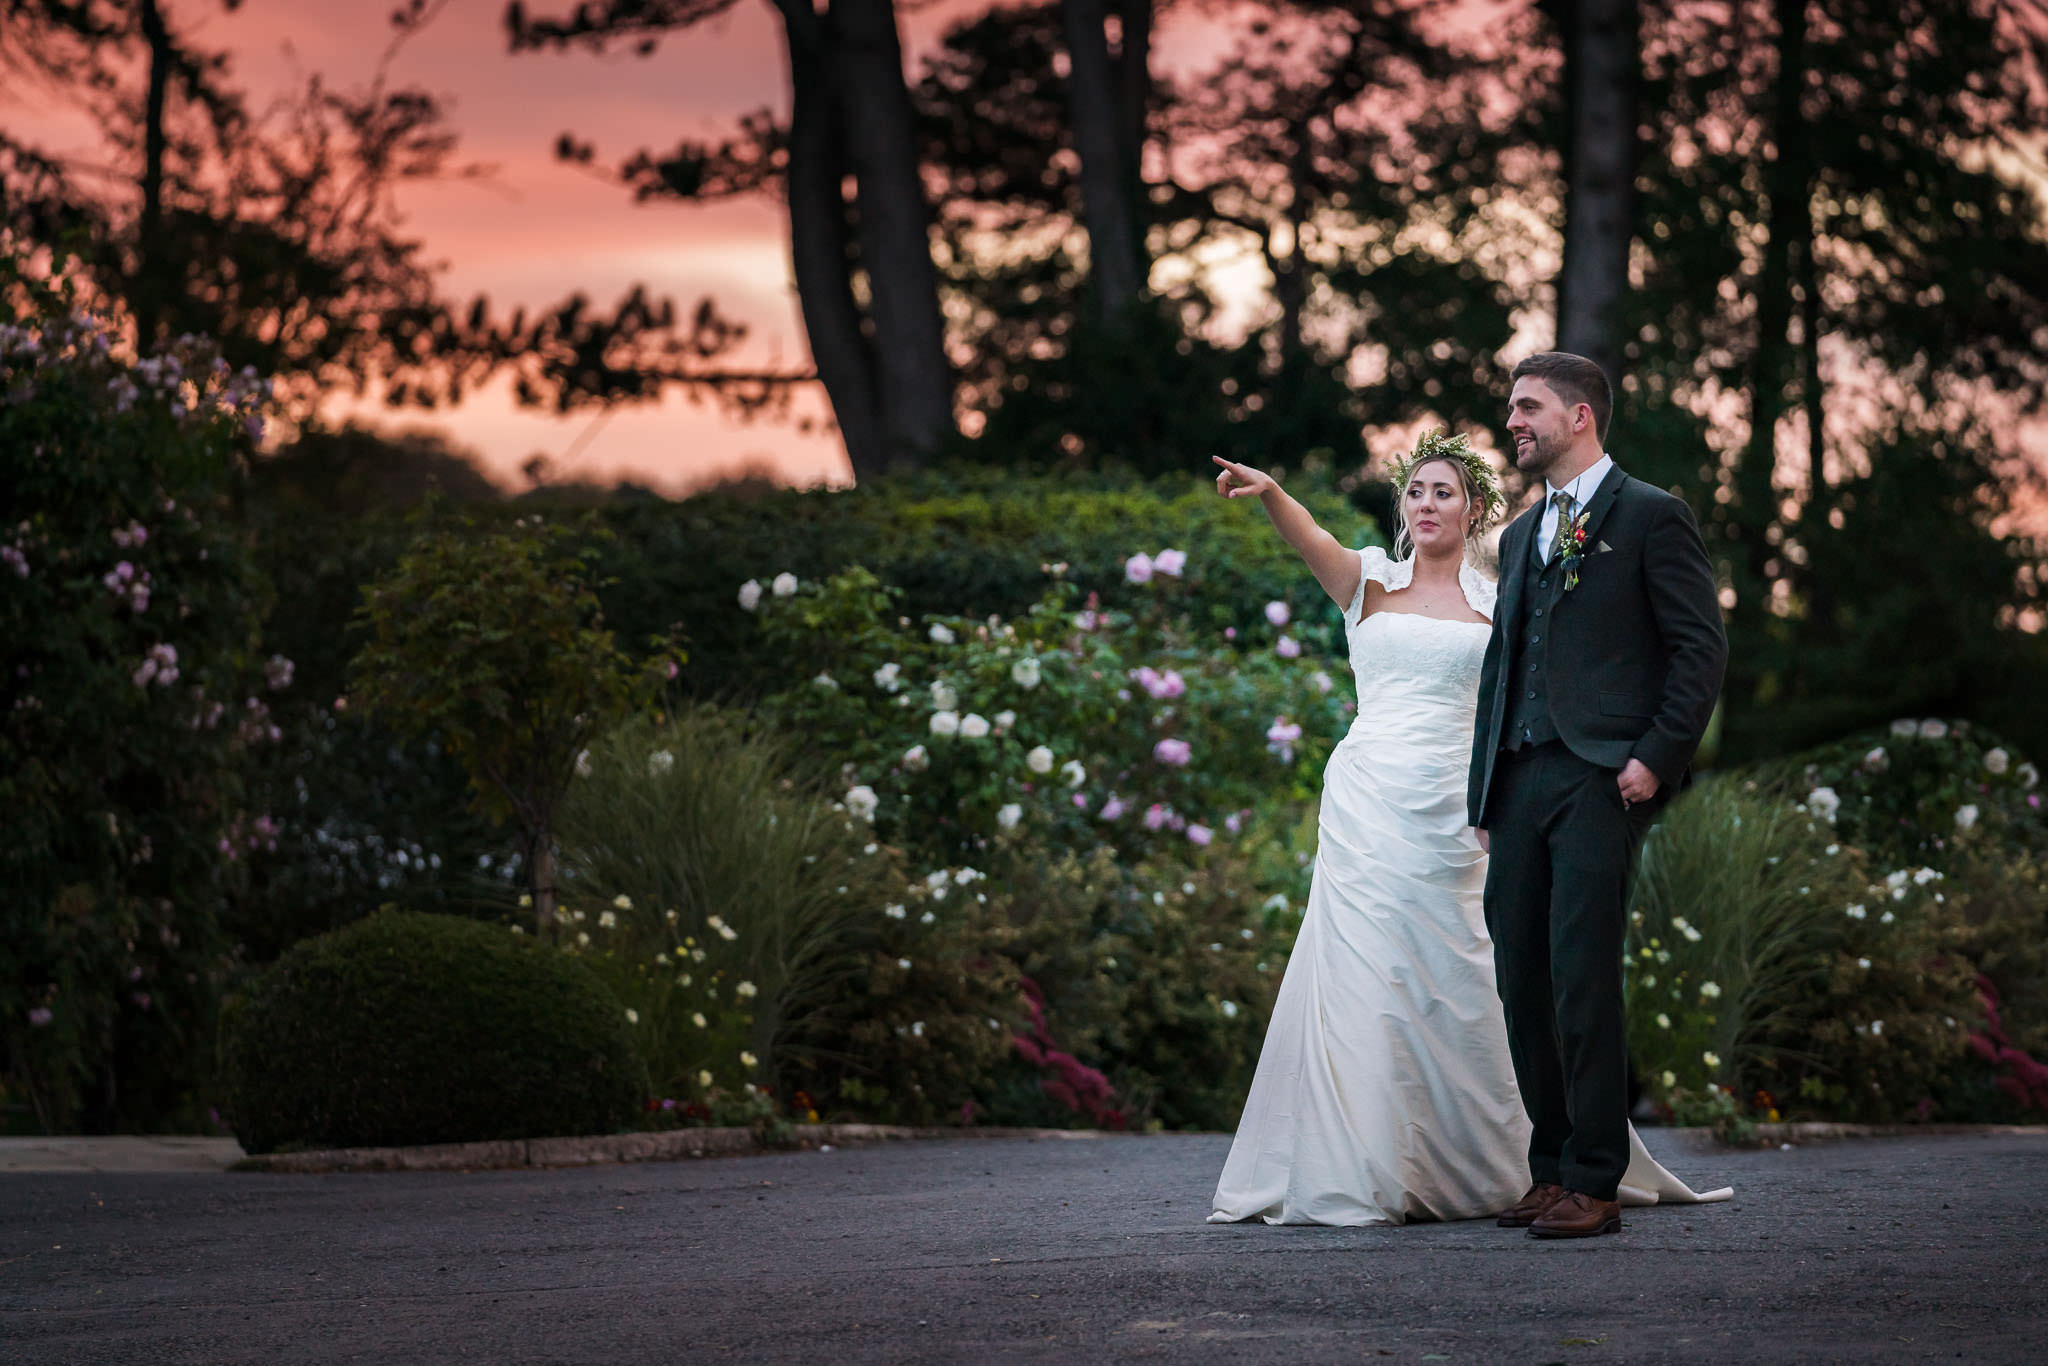 NC-2018-10-07_alex-and-nick-wedding-1557.jpg